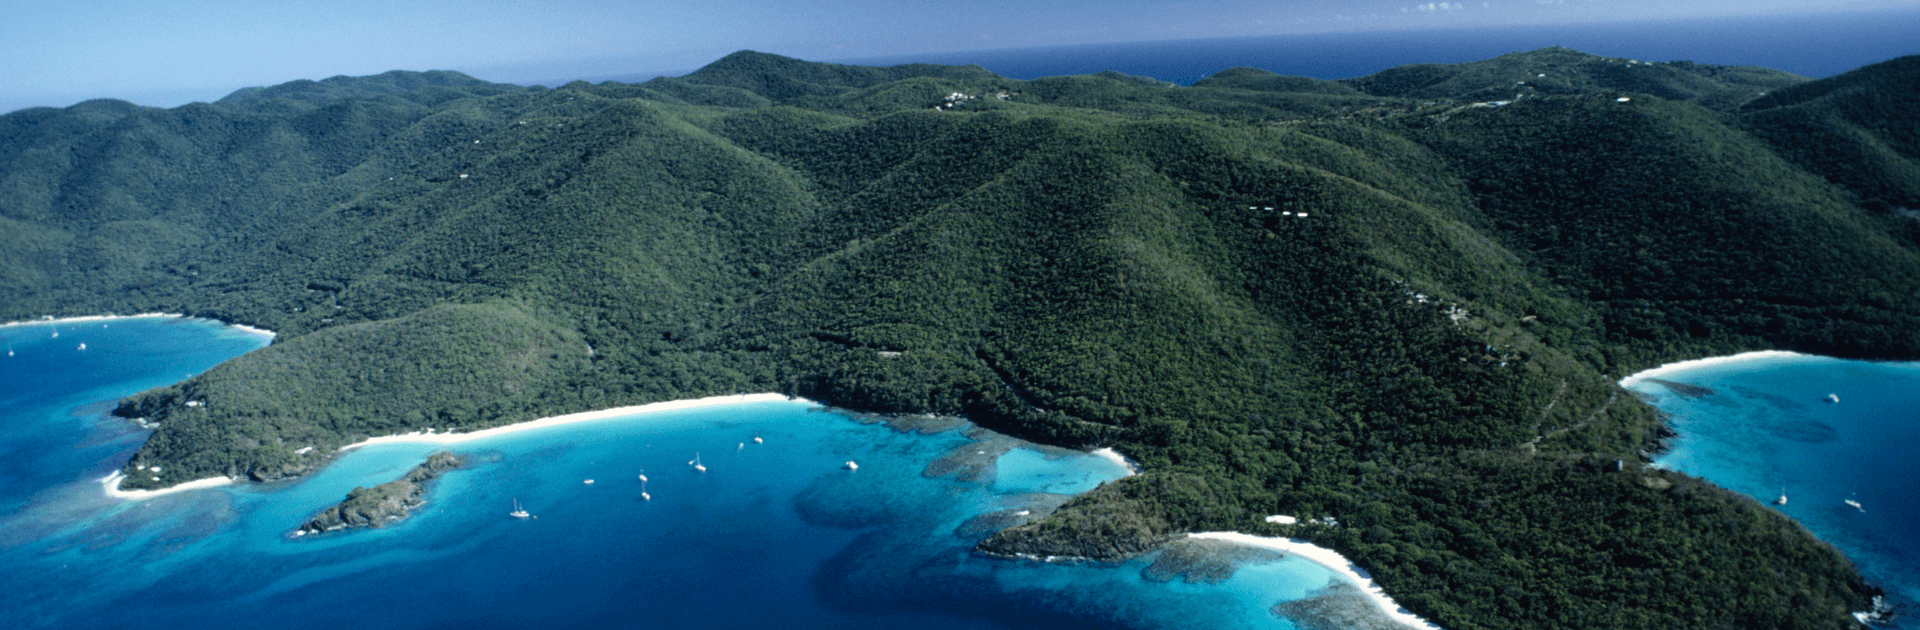 Aerial View of St. John in the US Virgin Islands